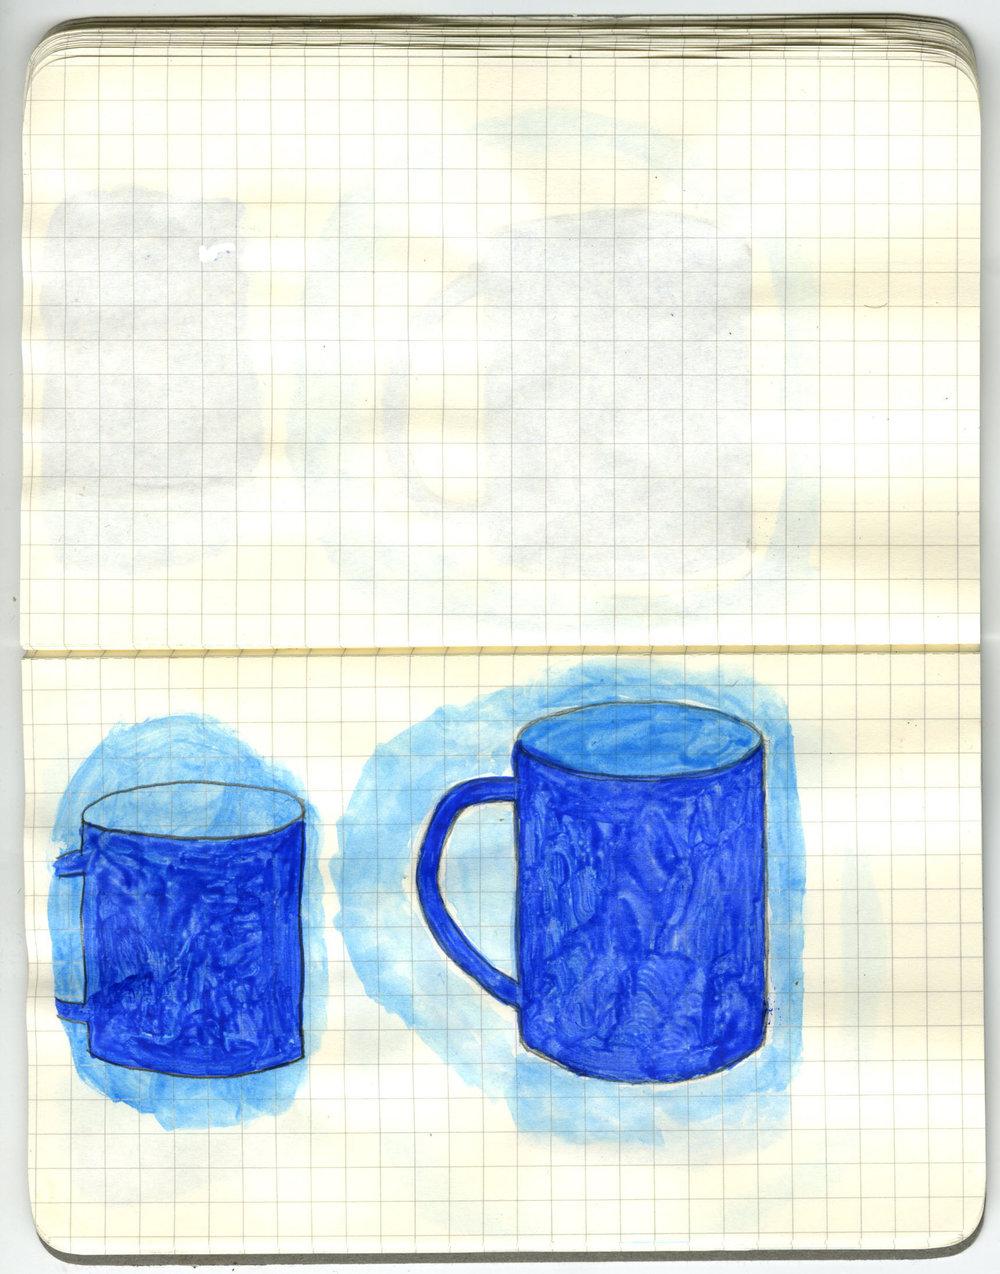 cup024.jpg